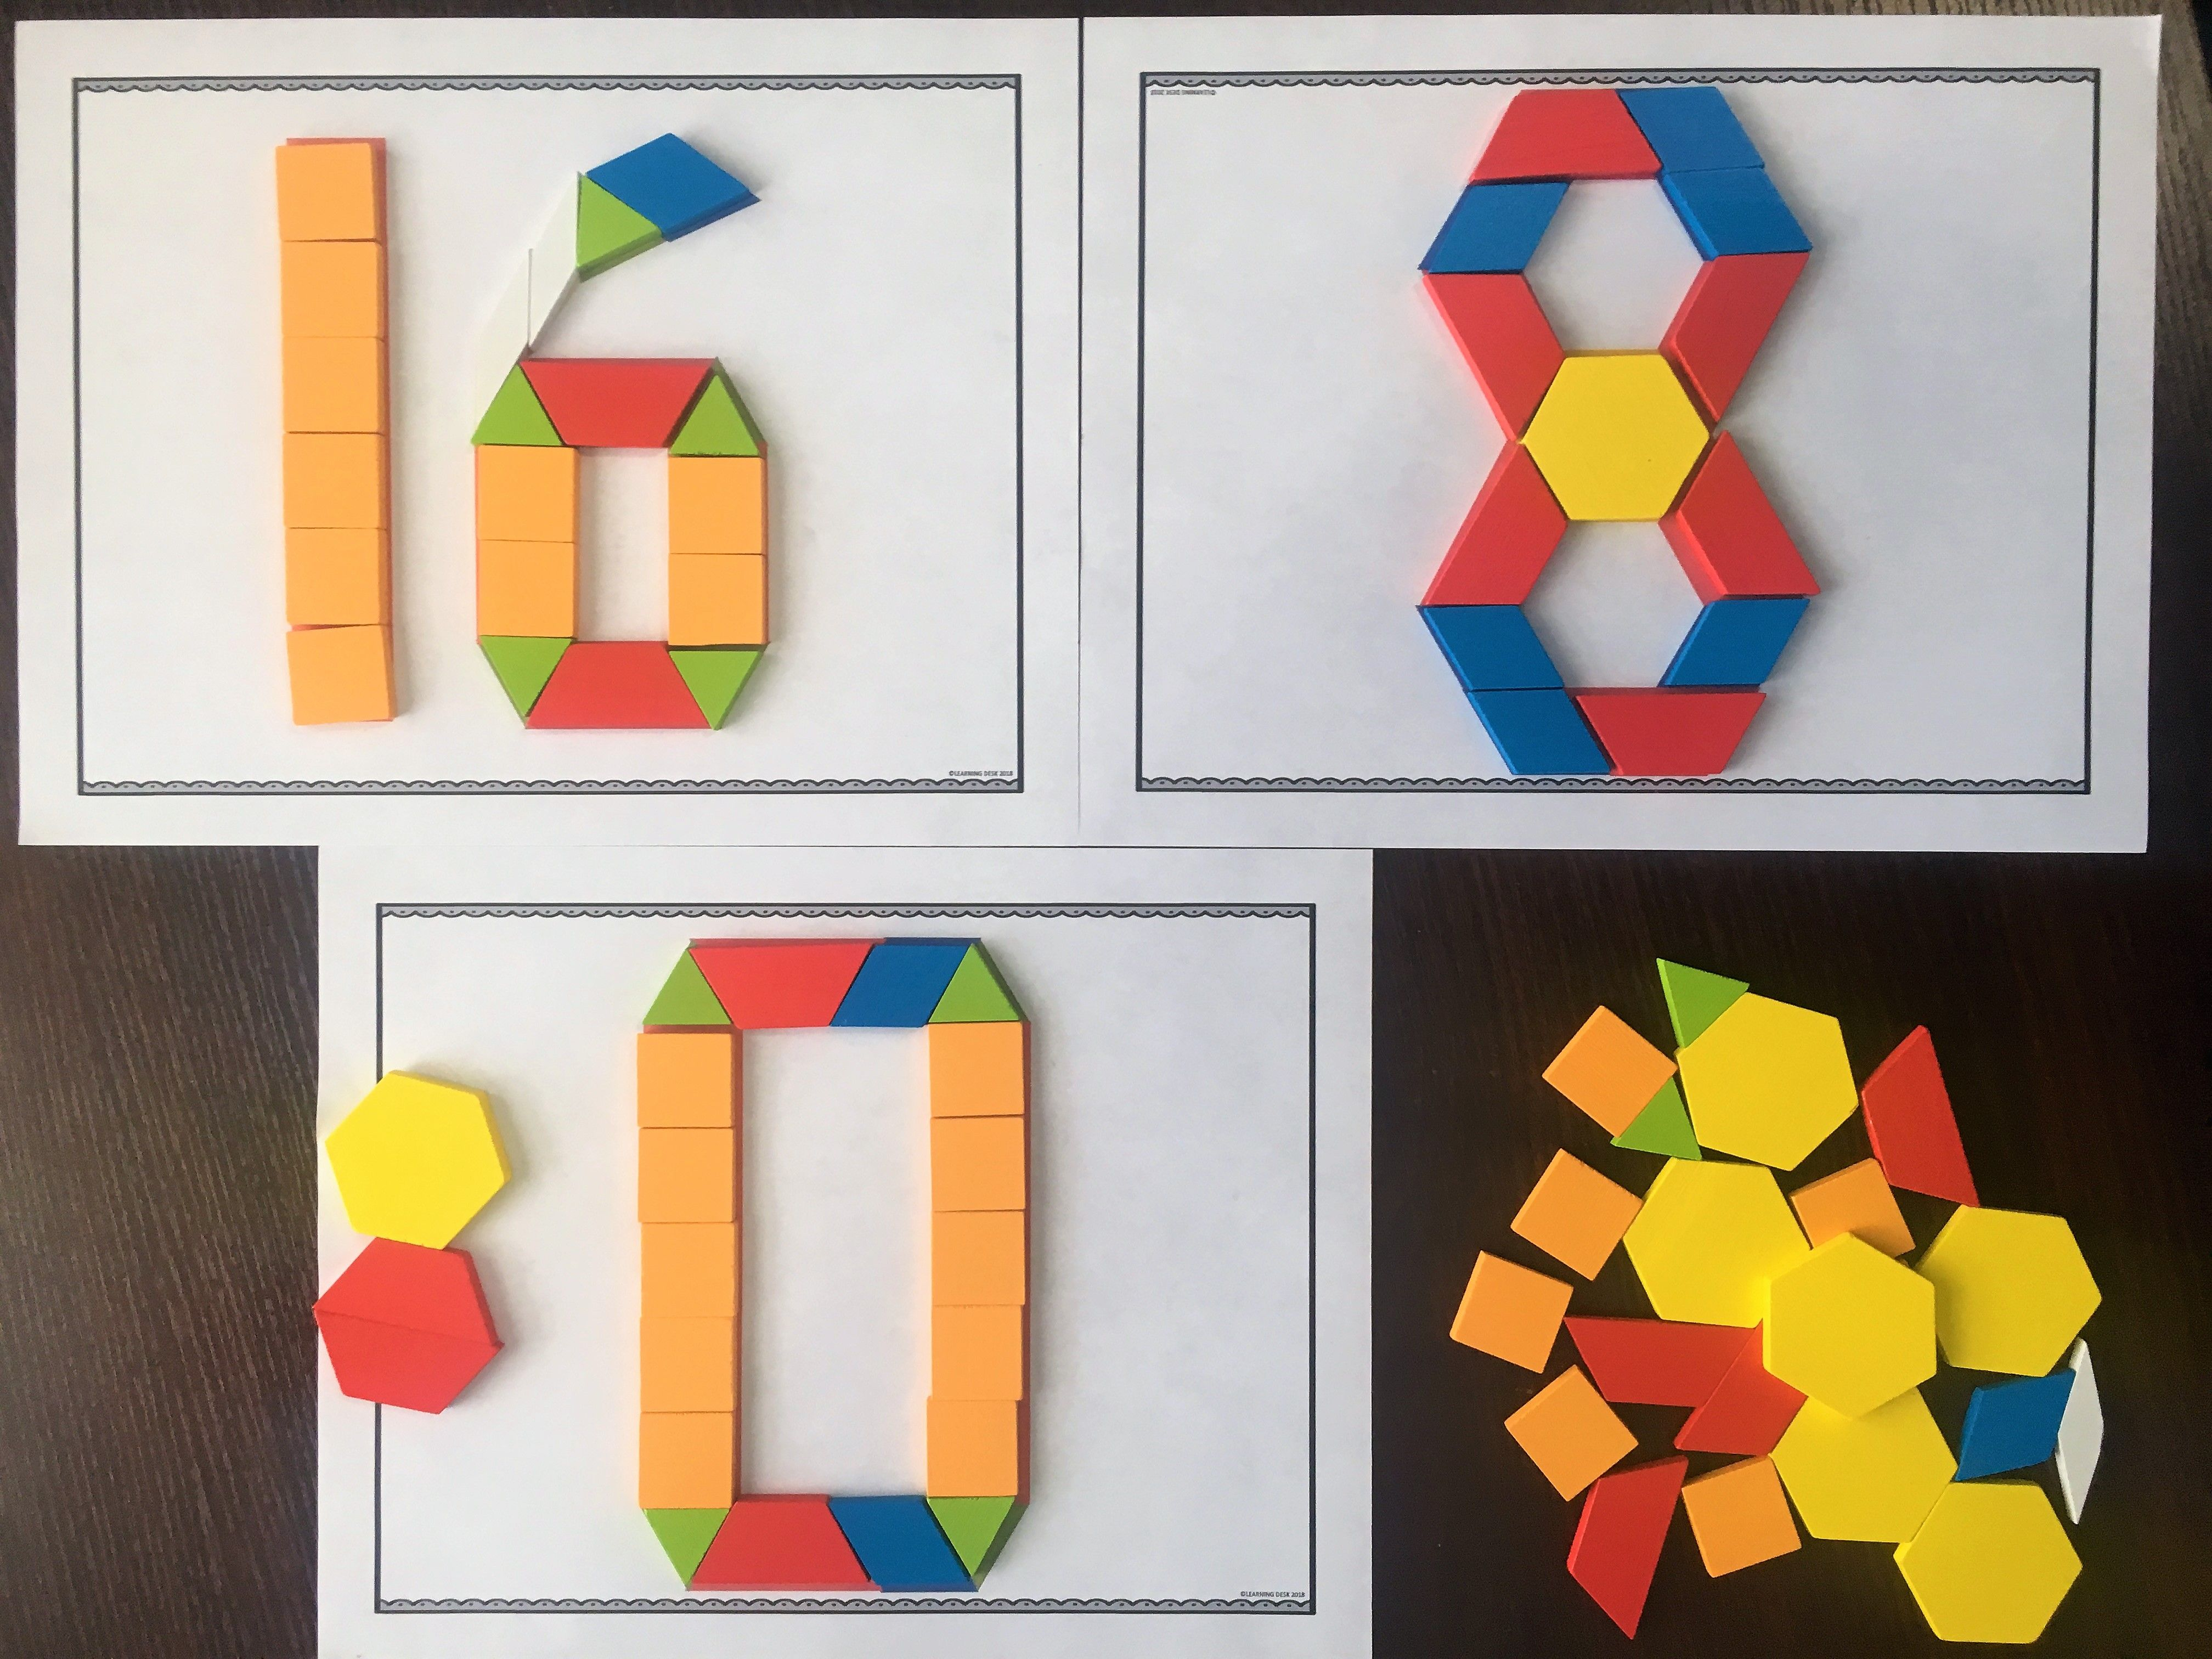 Pattern Block Templates Fine Motor Skill Activities Numbers Pattern Blocks Pattern Blocks Activities Pattern Block Templates [ 3024 x 4032 Pixel ]